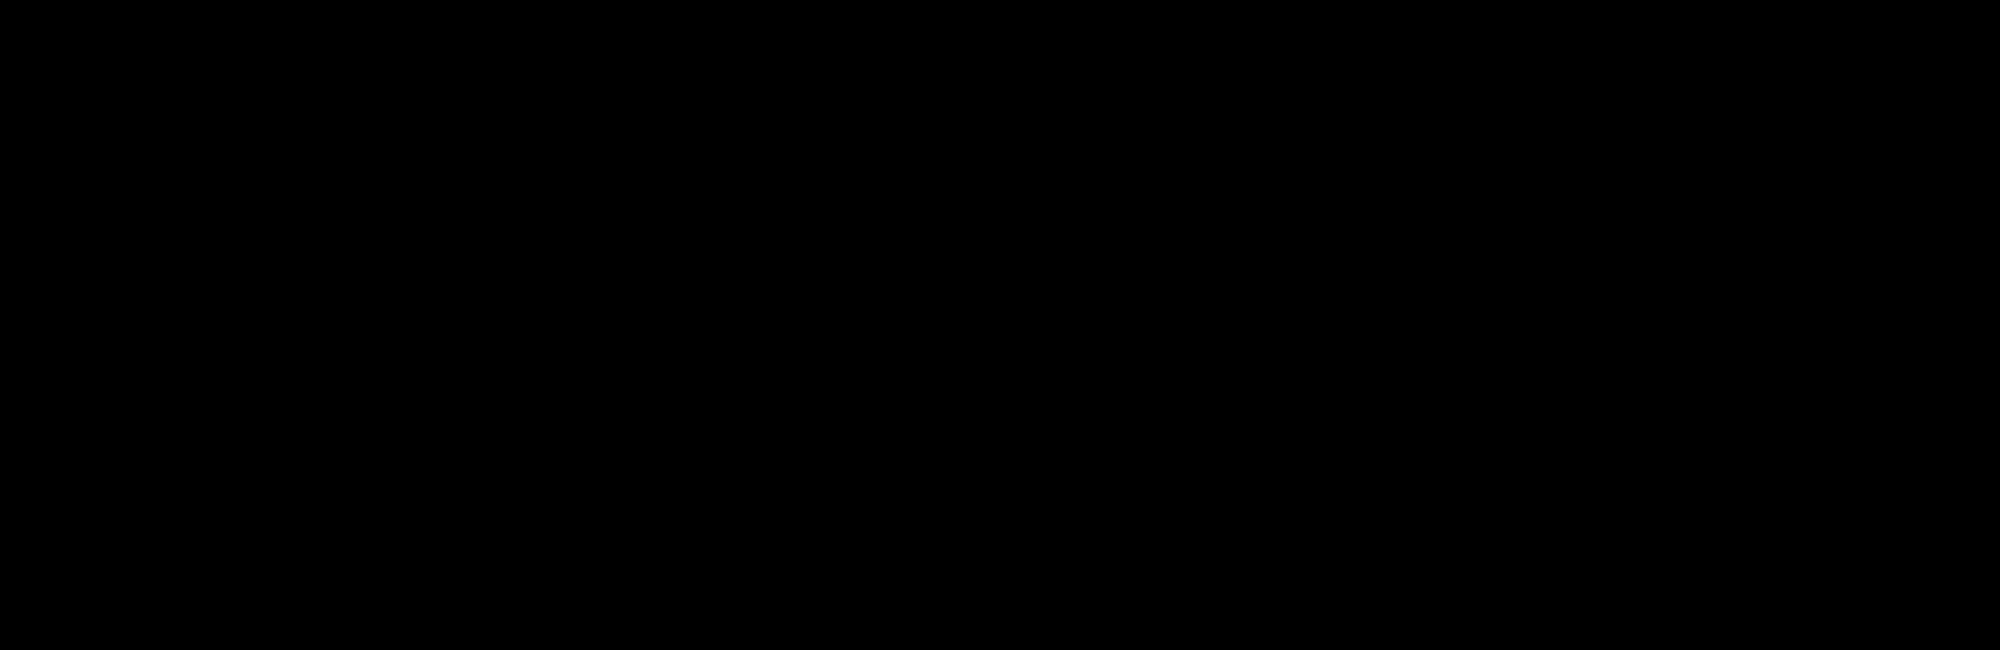 johnnie walker logos hd - Walker PNG HD